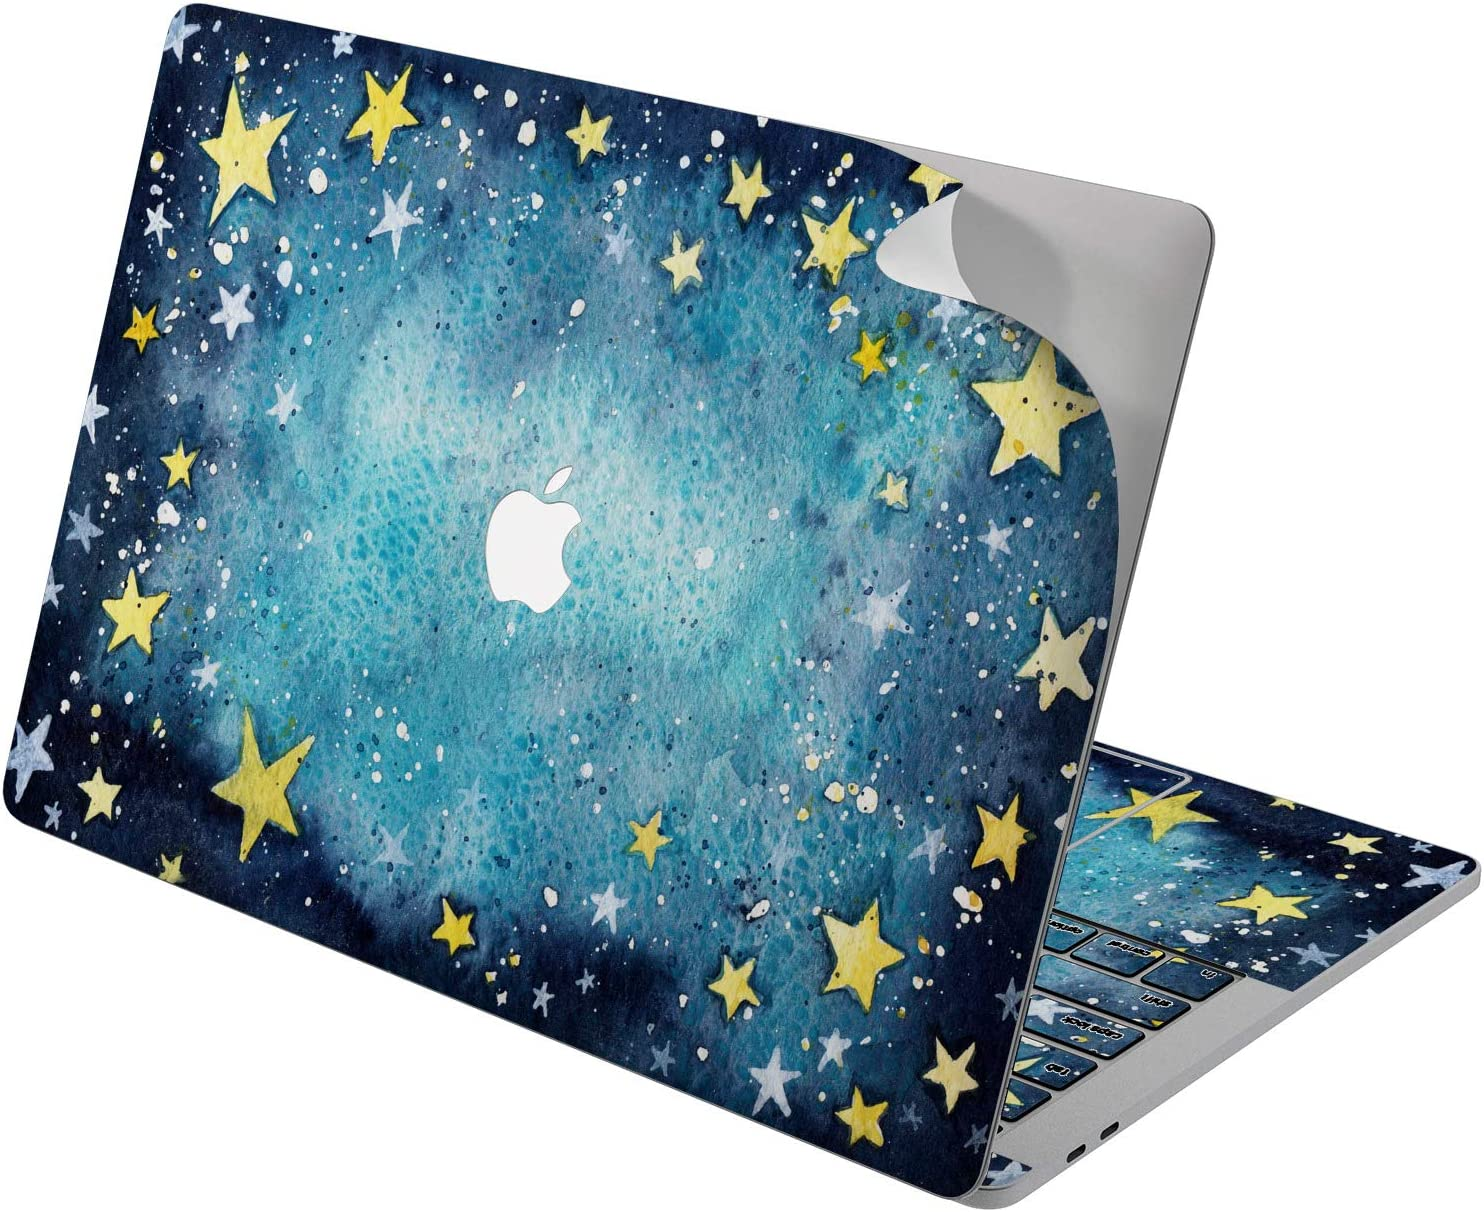 "Cavka Vinyl Decal Skin for Apple MacBook Pro 13"" 2019 15"" 2018 Air 13"" 2020 Retina 2015 Mac 11"" Mac 12"" Stars Cute Painted Celestial Laptop Sky Design Sticker Night Print Cover Watercolor Protective"